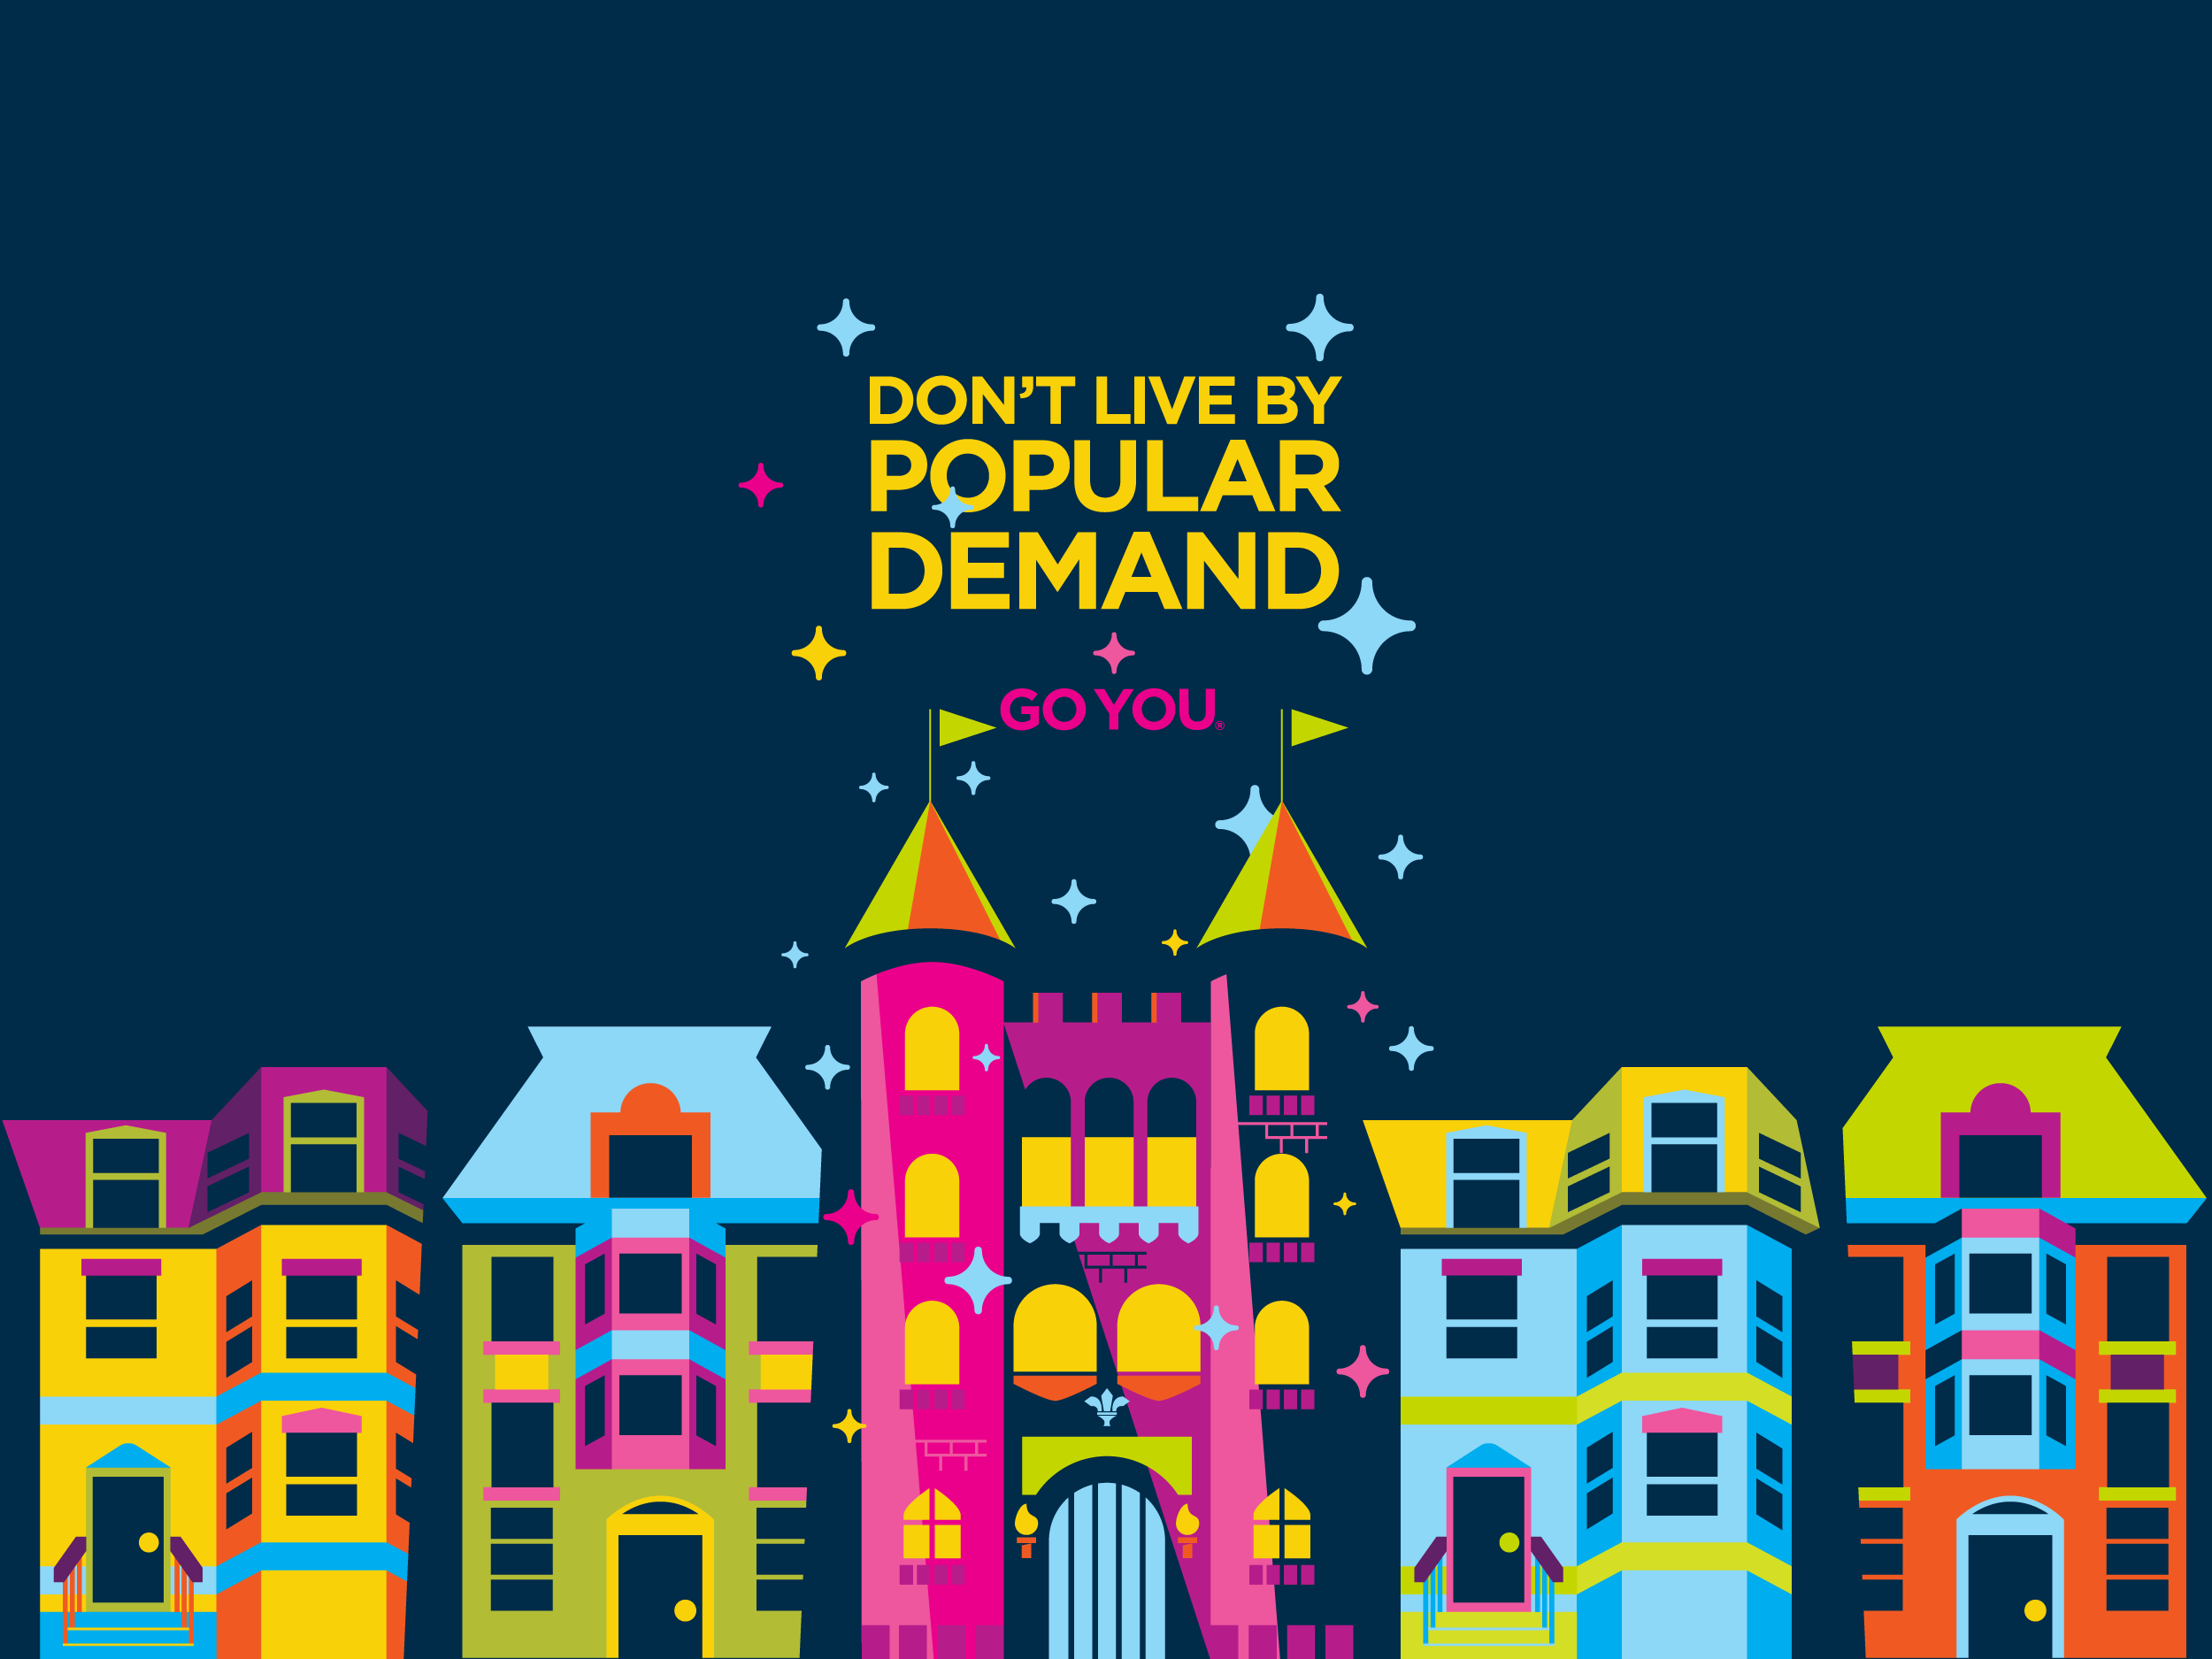 Do not live by popular demand CS4-31.png